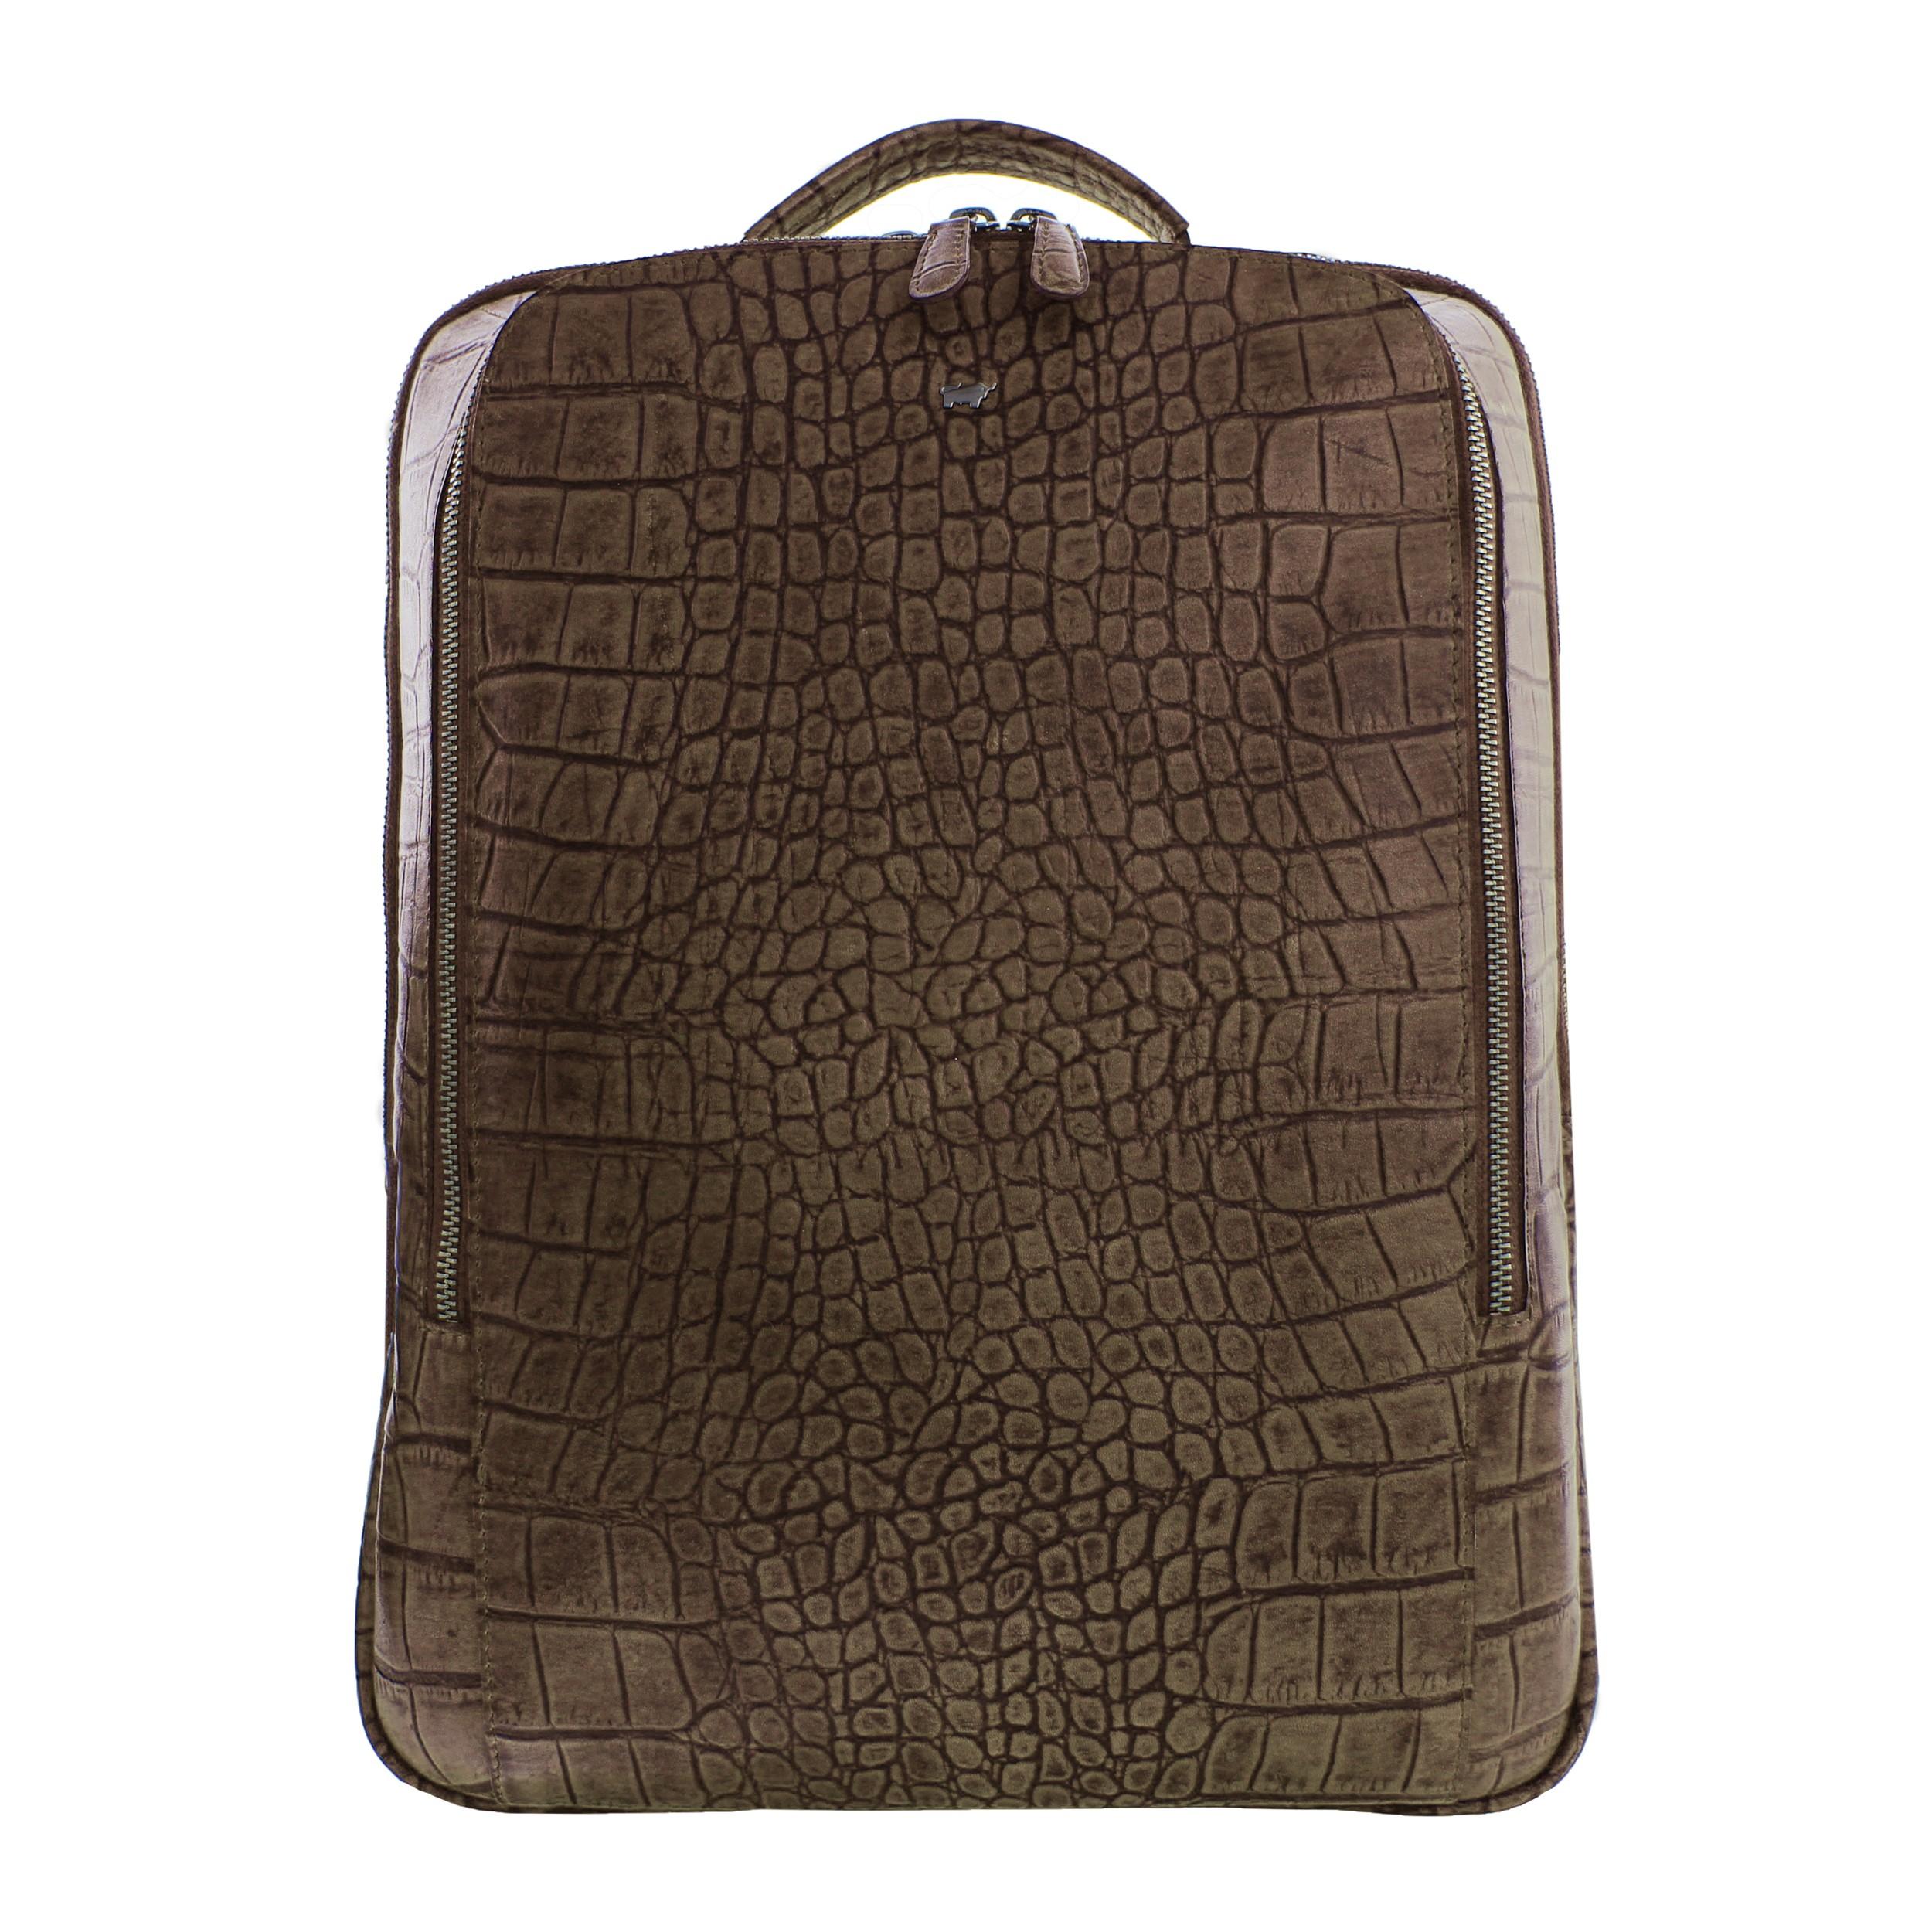 lisboa-rucksack-Rindleder in Kroko-Optik-69169-701-31